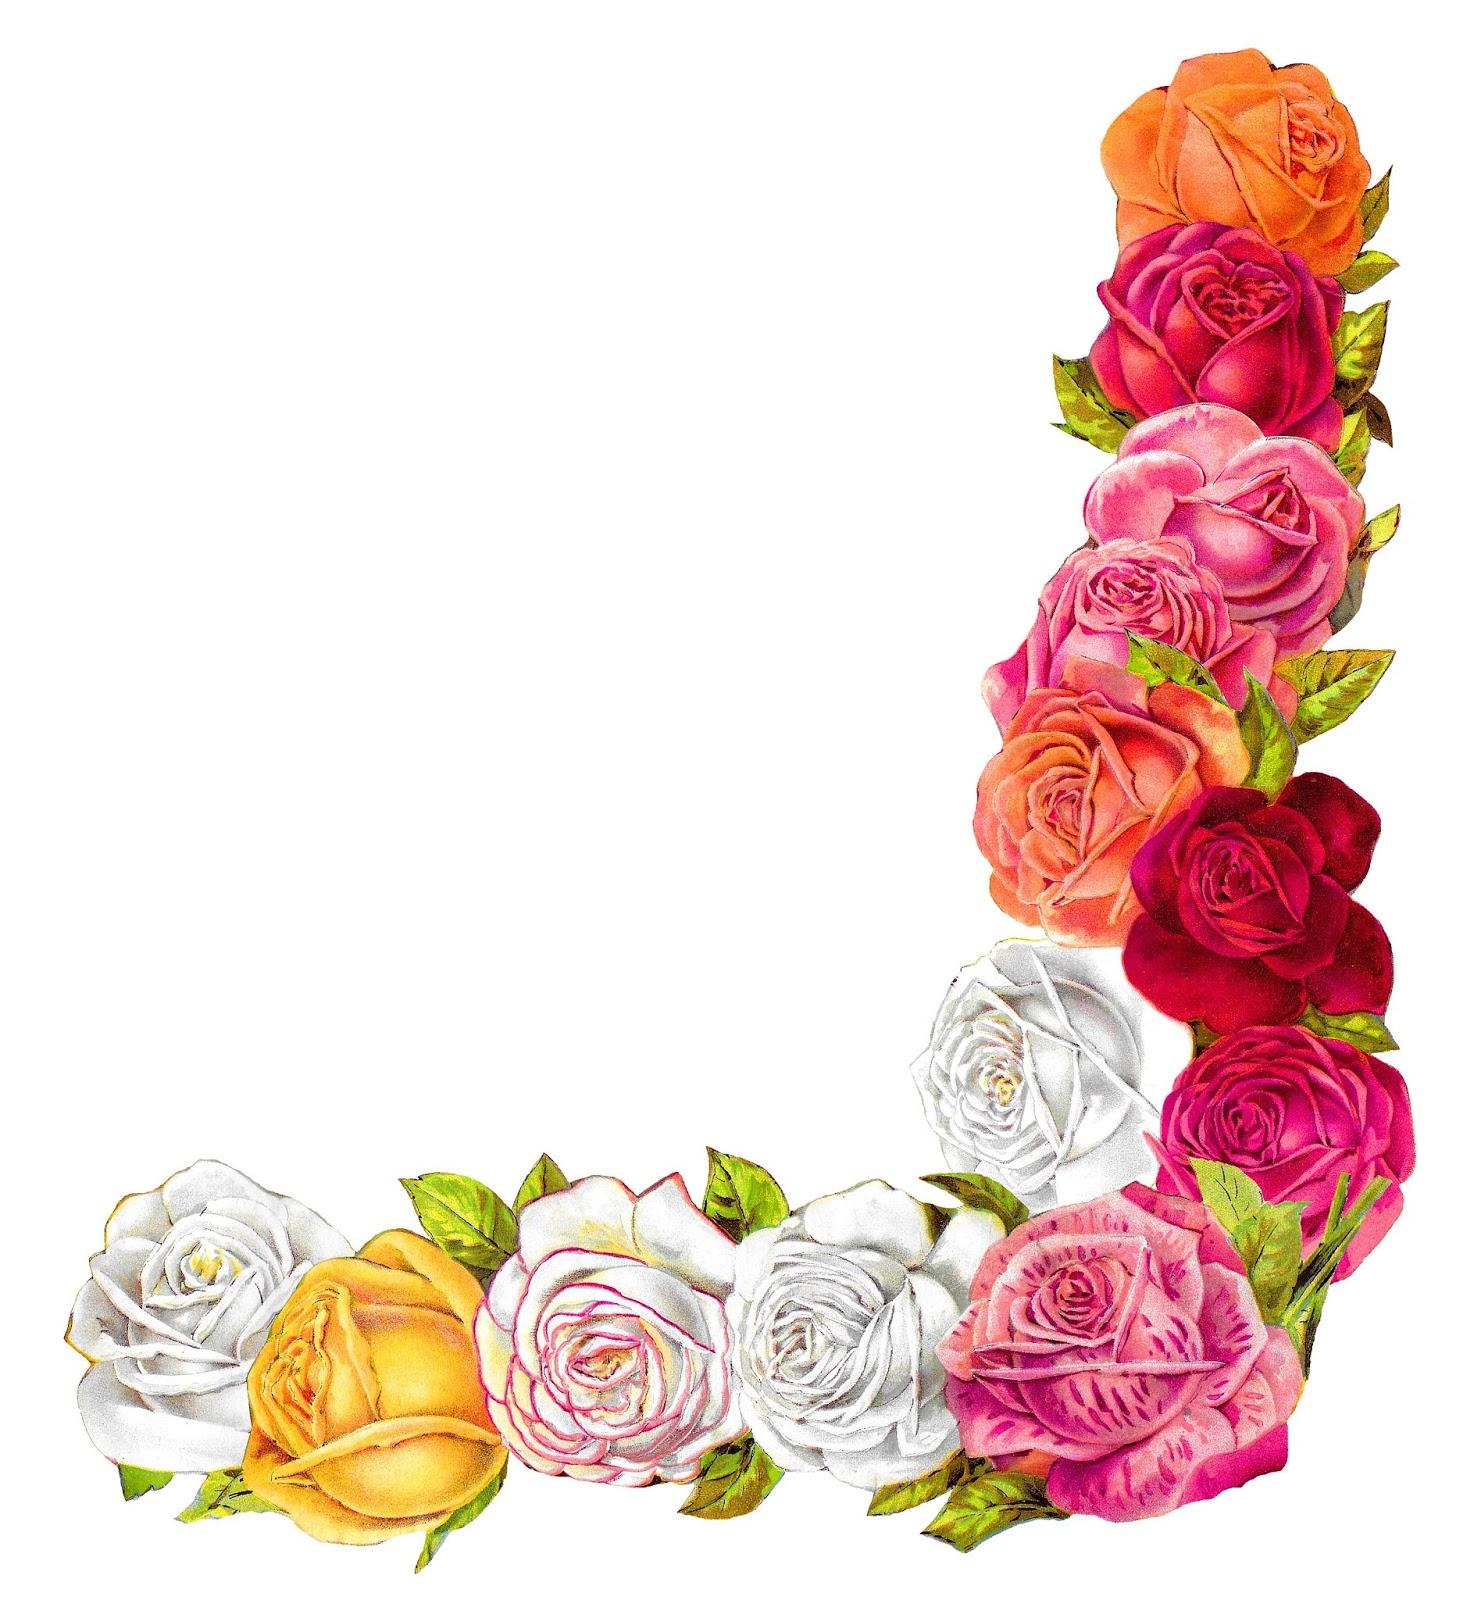 Flowers Rose Shabby Chic Border Corner Scrapbooking Image Clipart